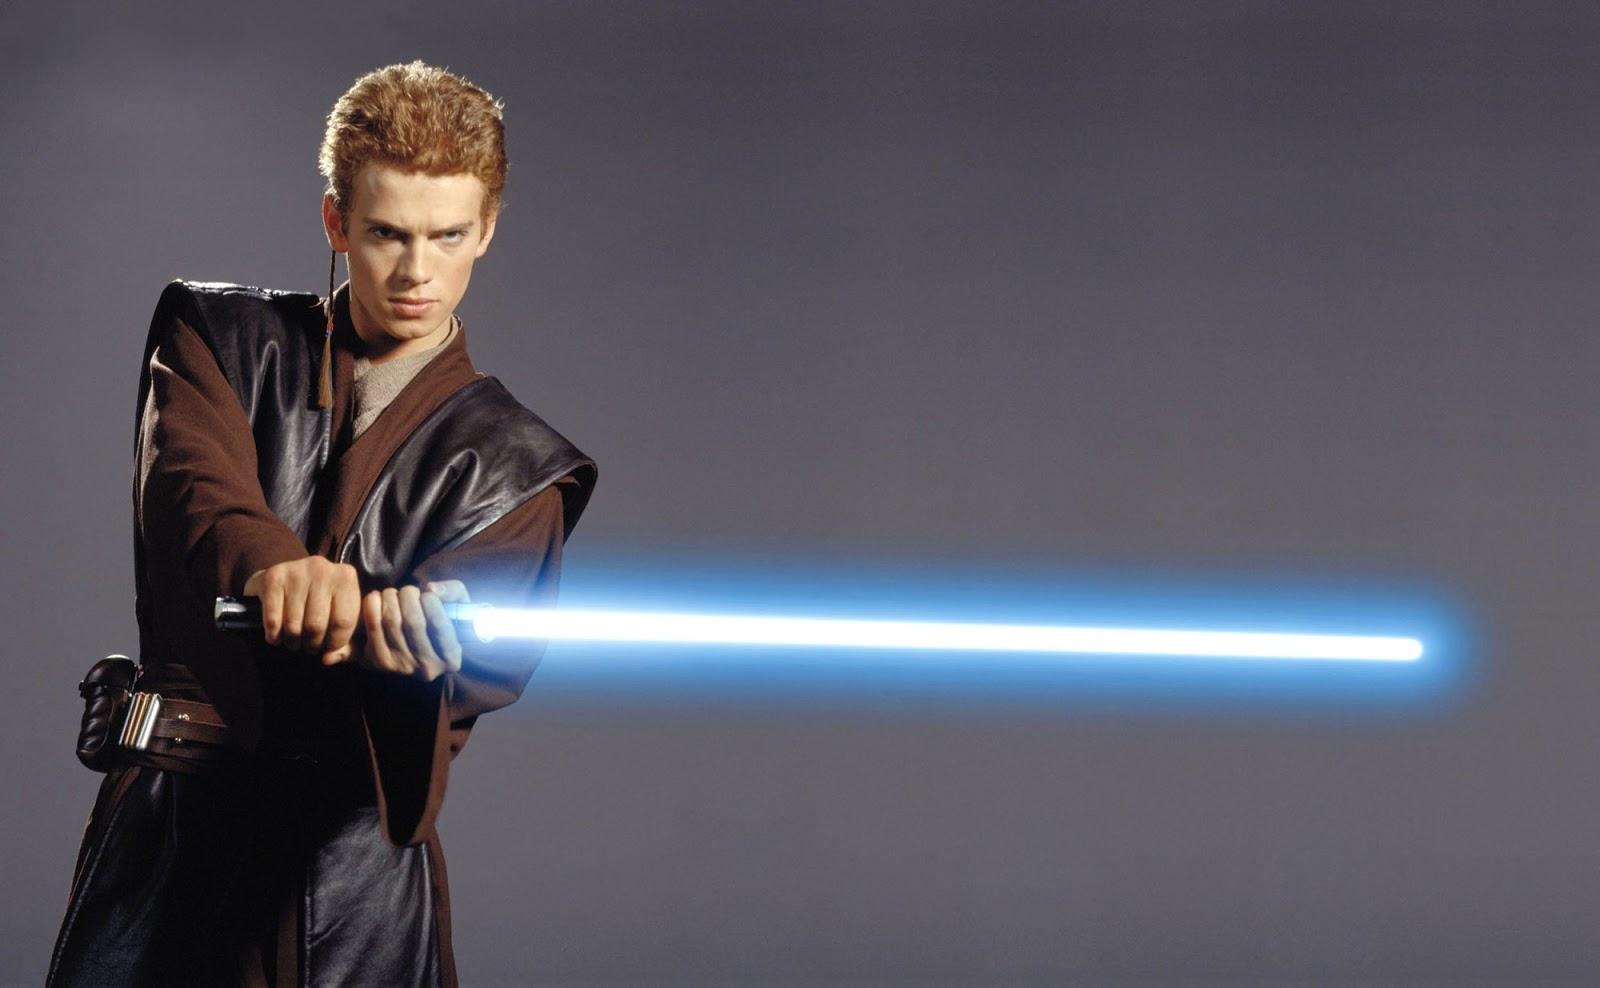 Attack-of-the-Clones-Anakin-Skywalker-anakin-skywalker-24957850-2000-1235.jpg